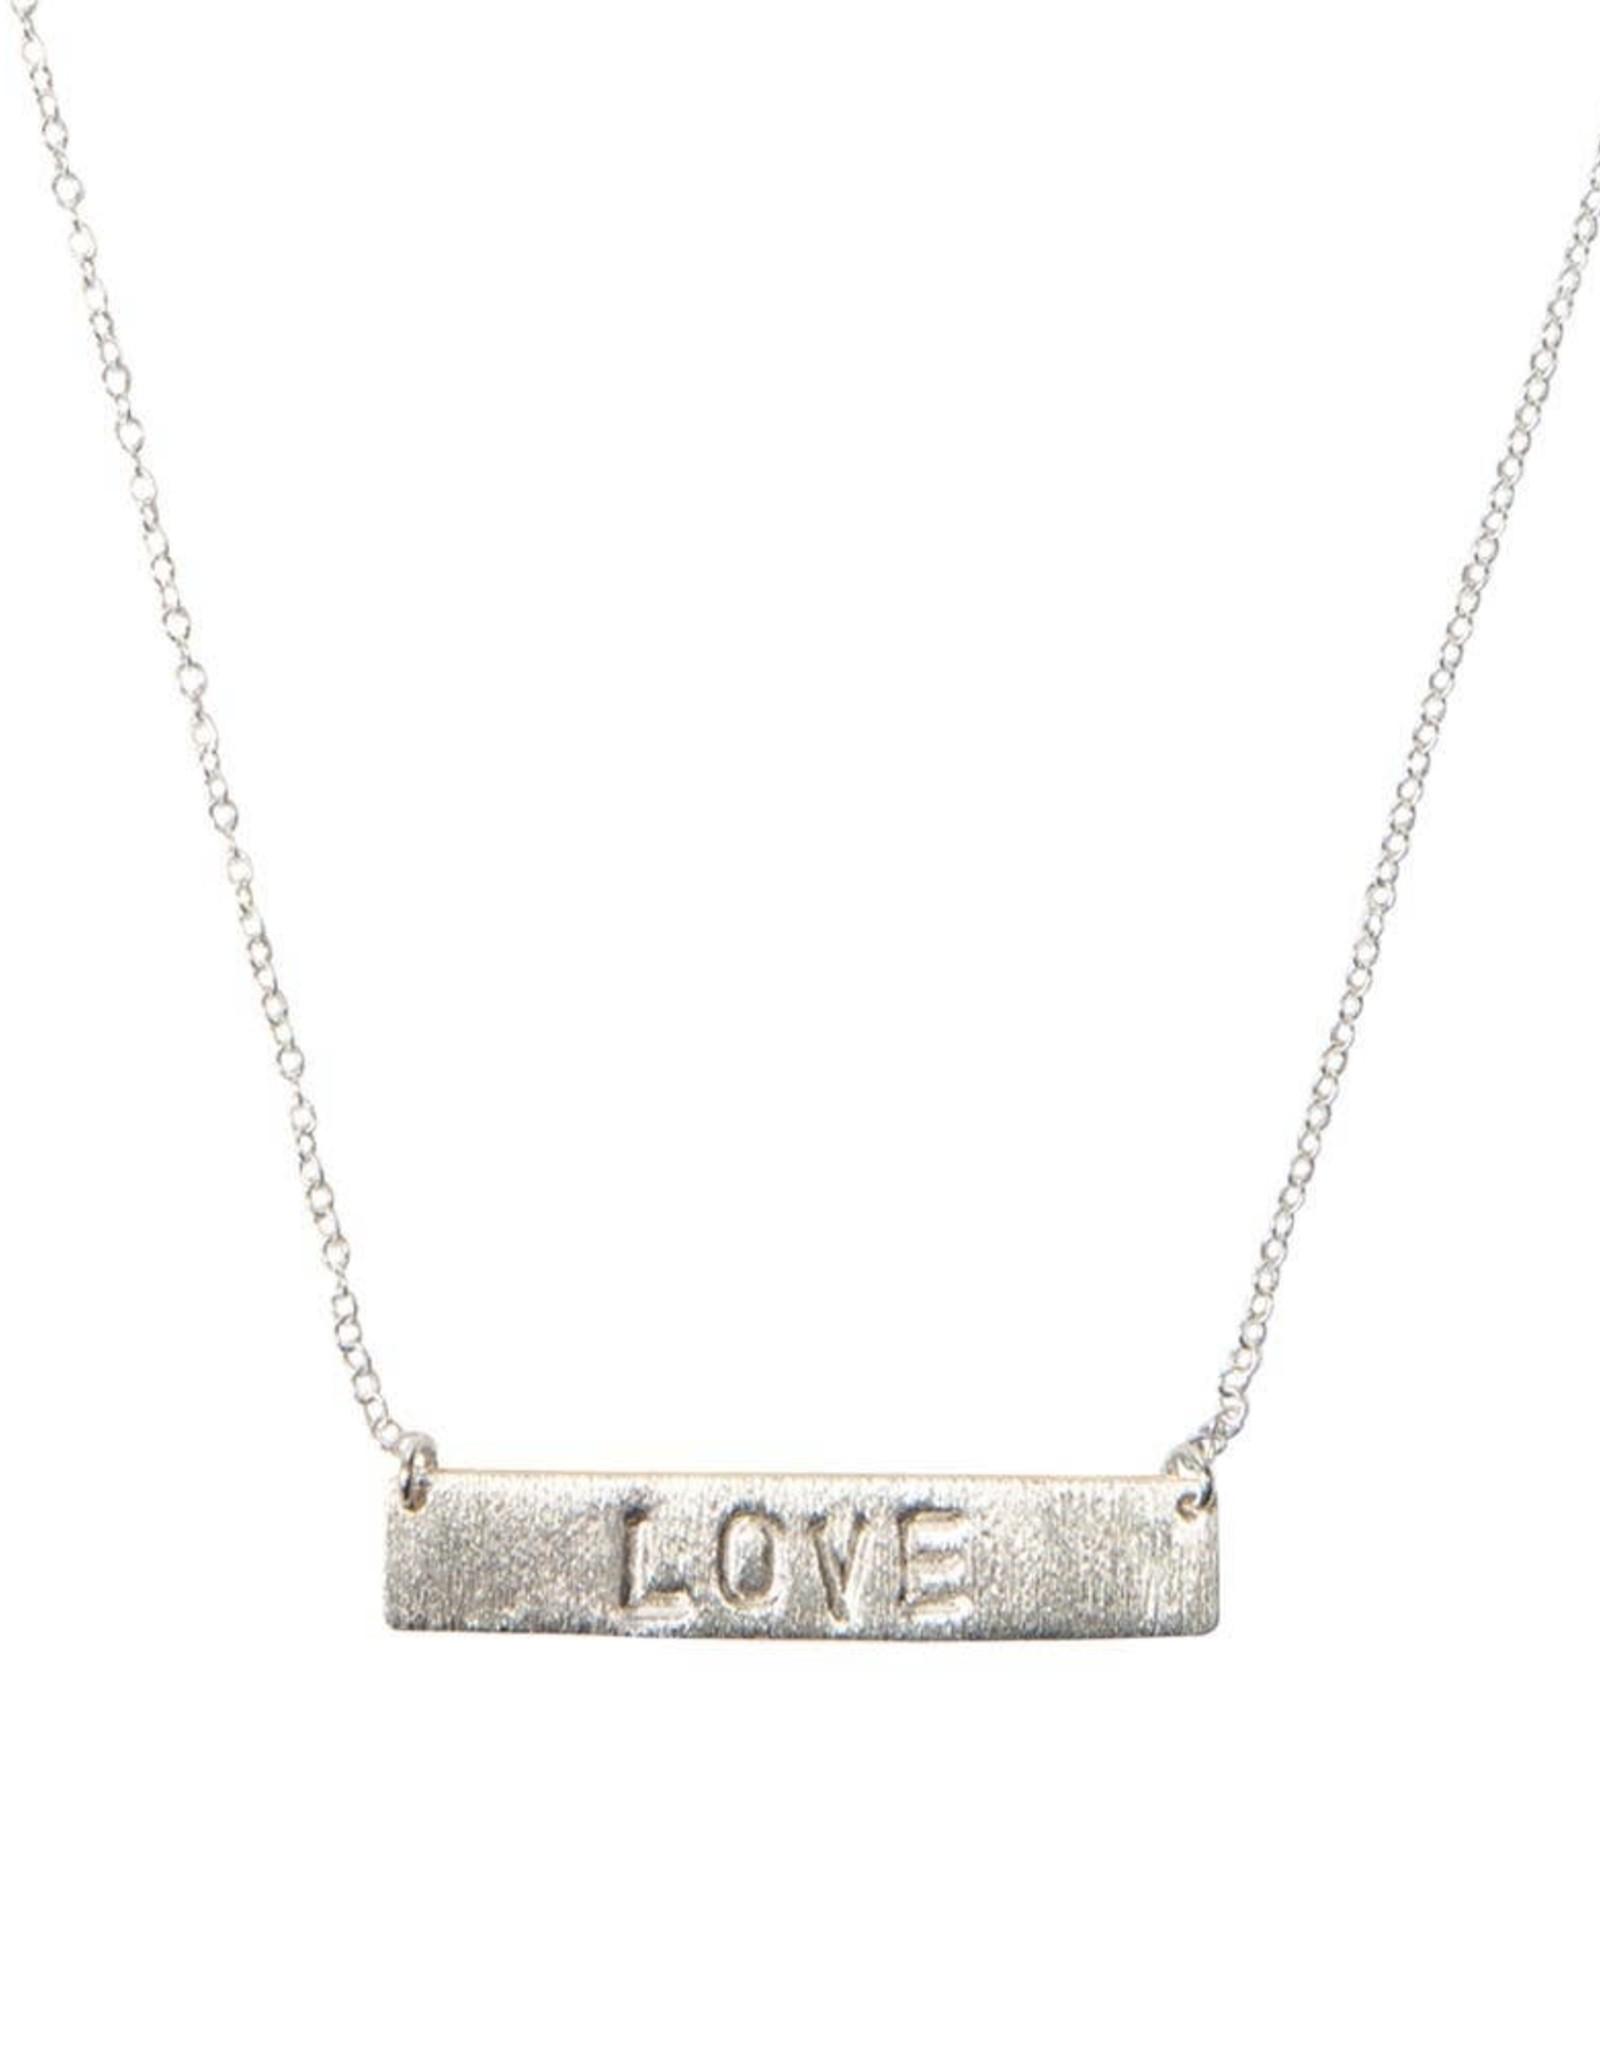 TTV USA Pure Love Necklace